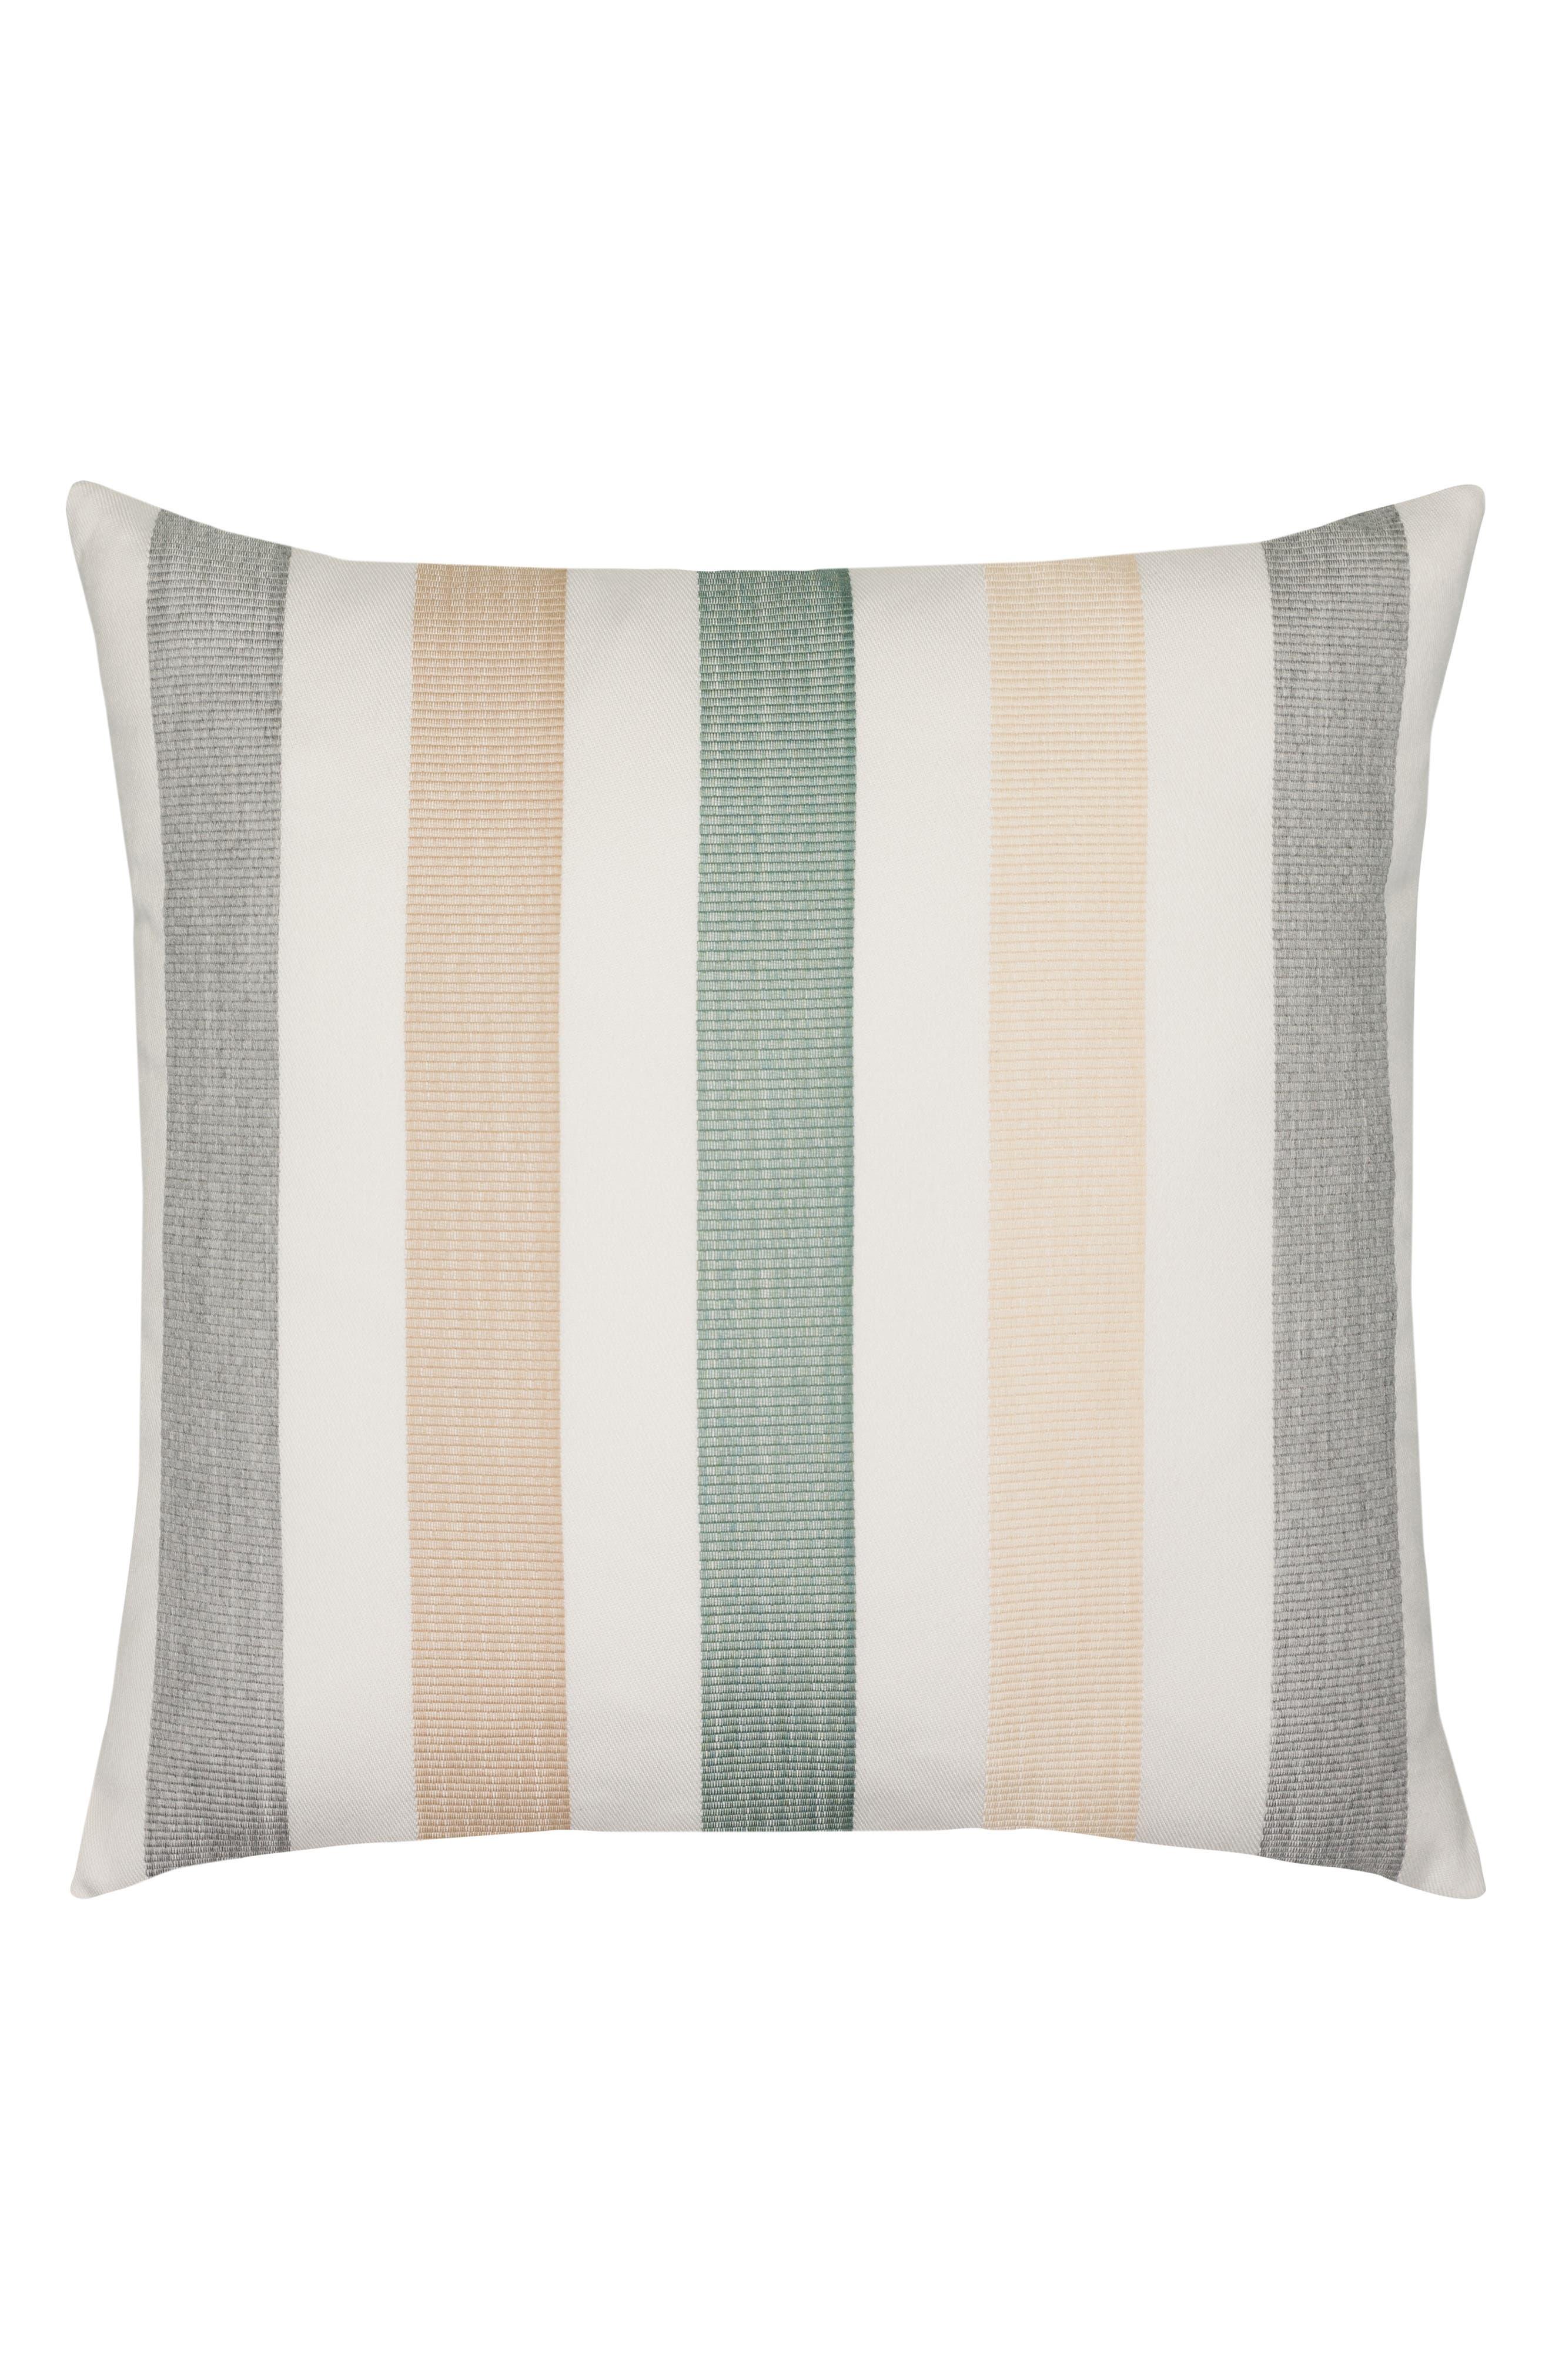 ELAINE SMITH,                             Axiom Indoor/Outdoor Accent Pillow,                             Main thumbnail 1, color,                             GRAY MULTI